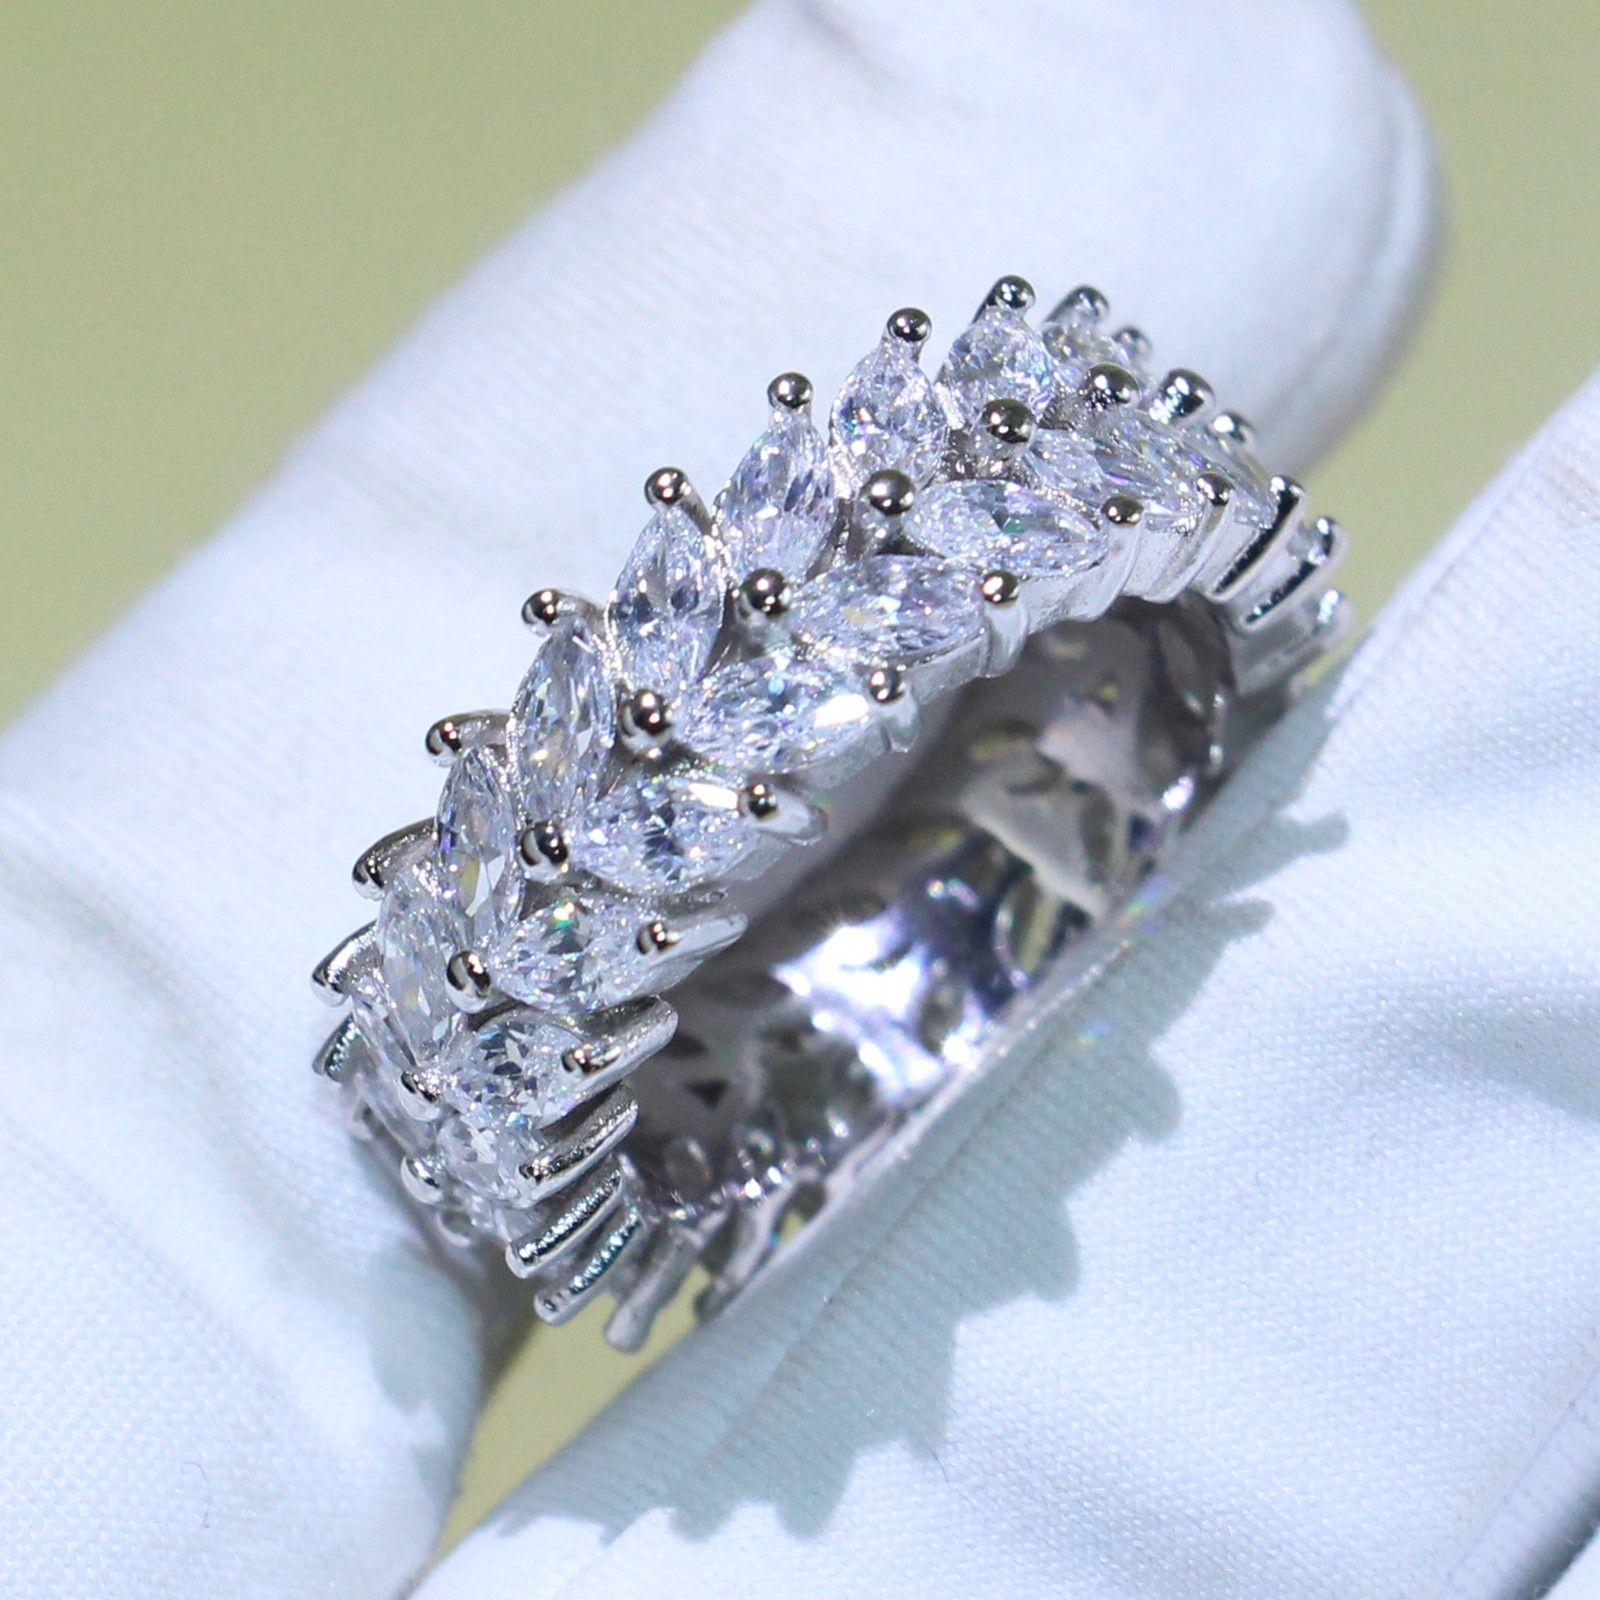 Victoria Wieck Infinito jóias de luxo 925 Sterling Silver Marquise branco impressionante Topaz Partido CZ diamante casamento banda anel para mulheres presente